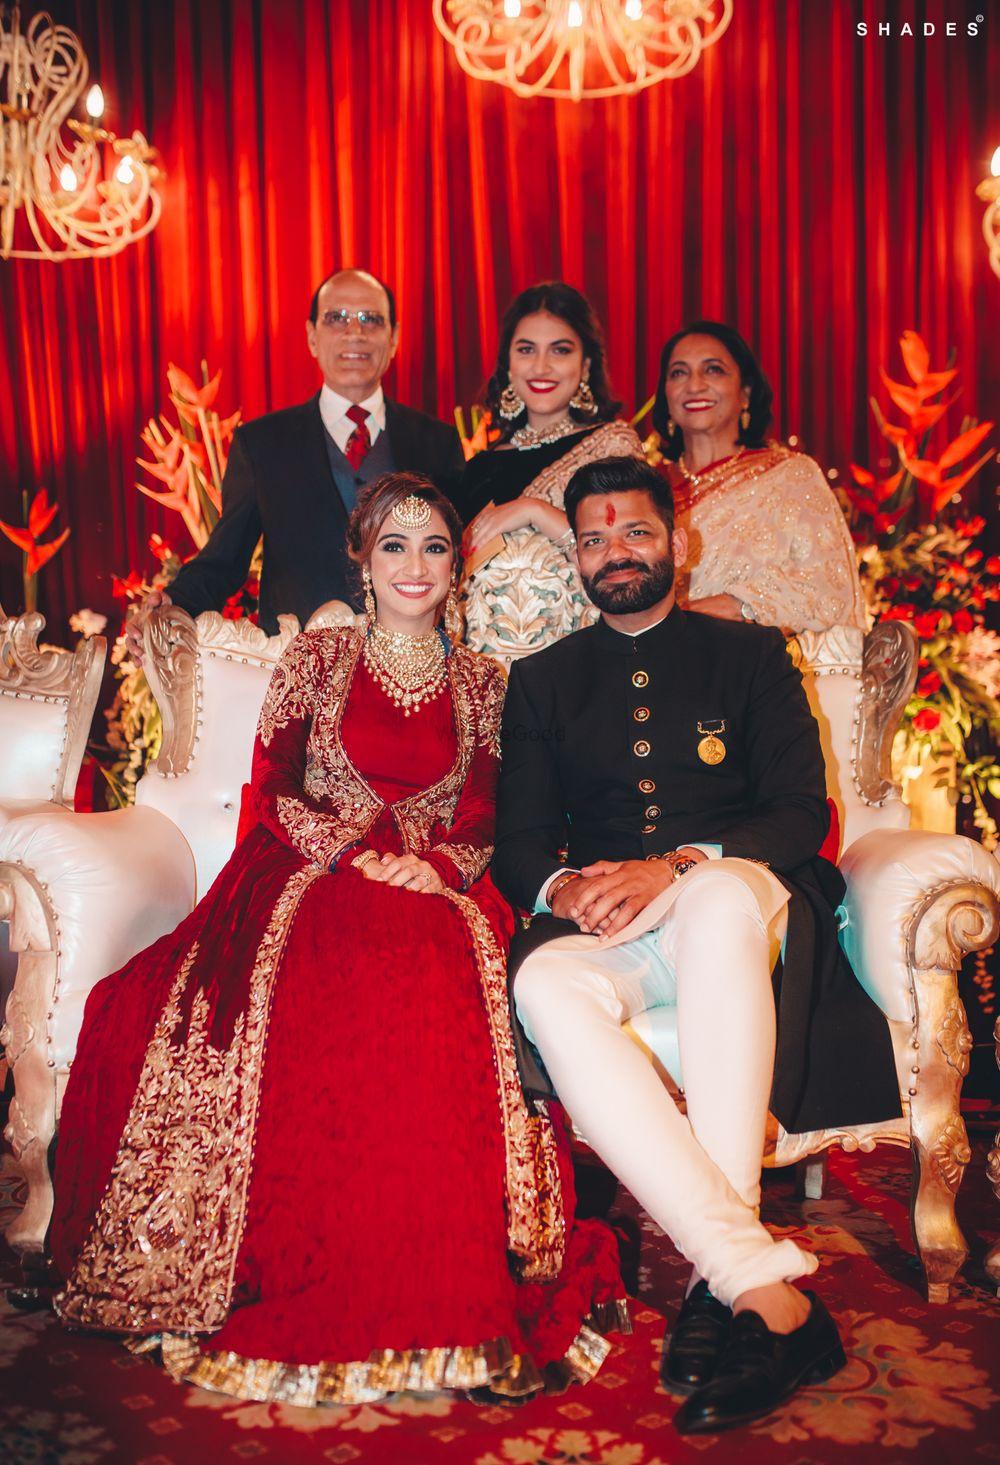 Photo from Chanu & Digvijay Wedding